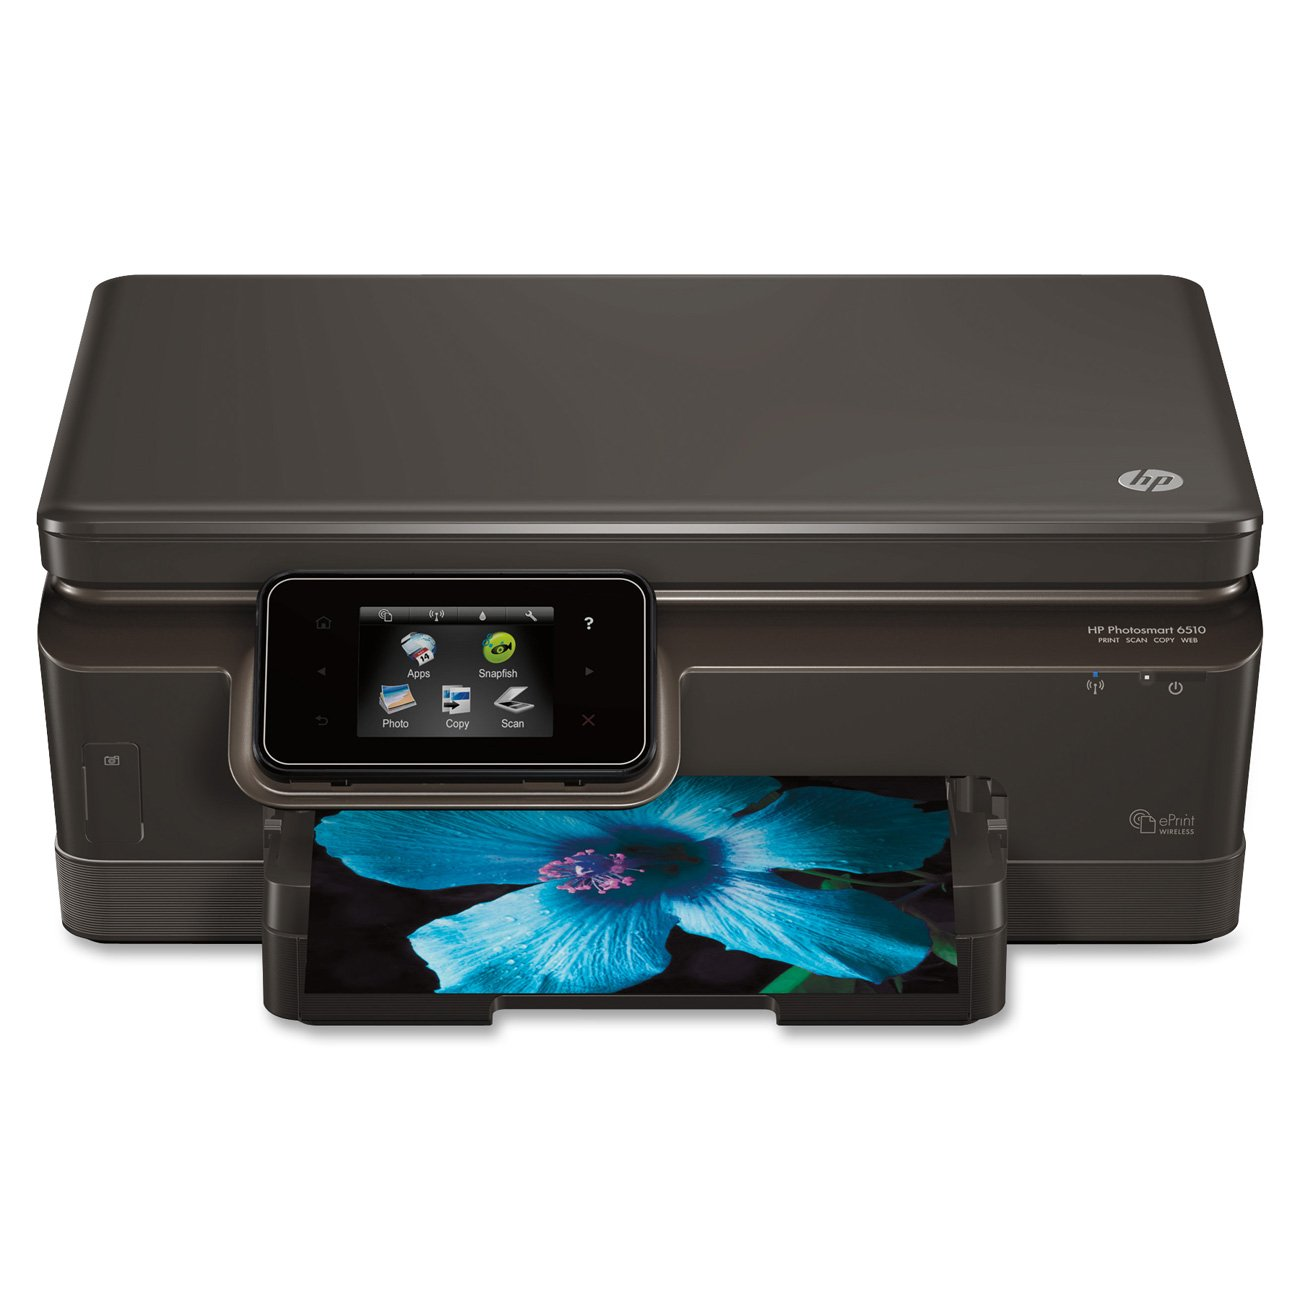 HP Photosmart 6510 e-All-in-One Printer (B211a)